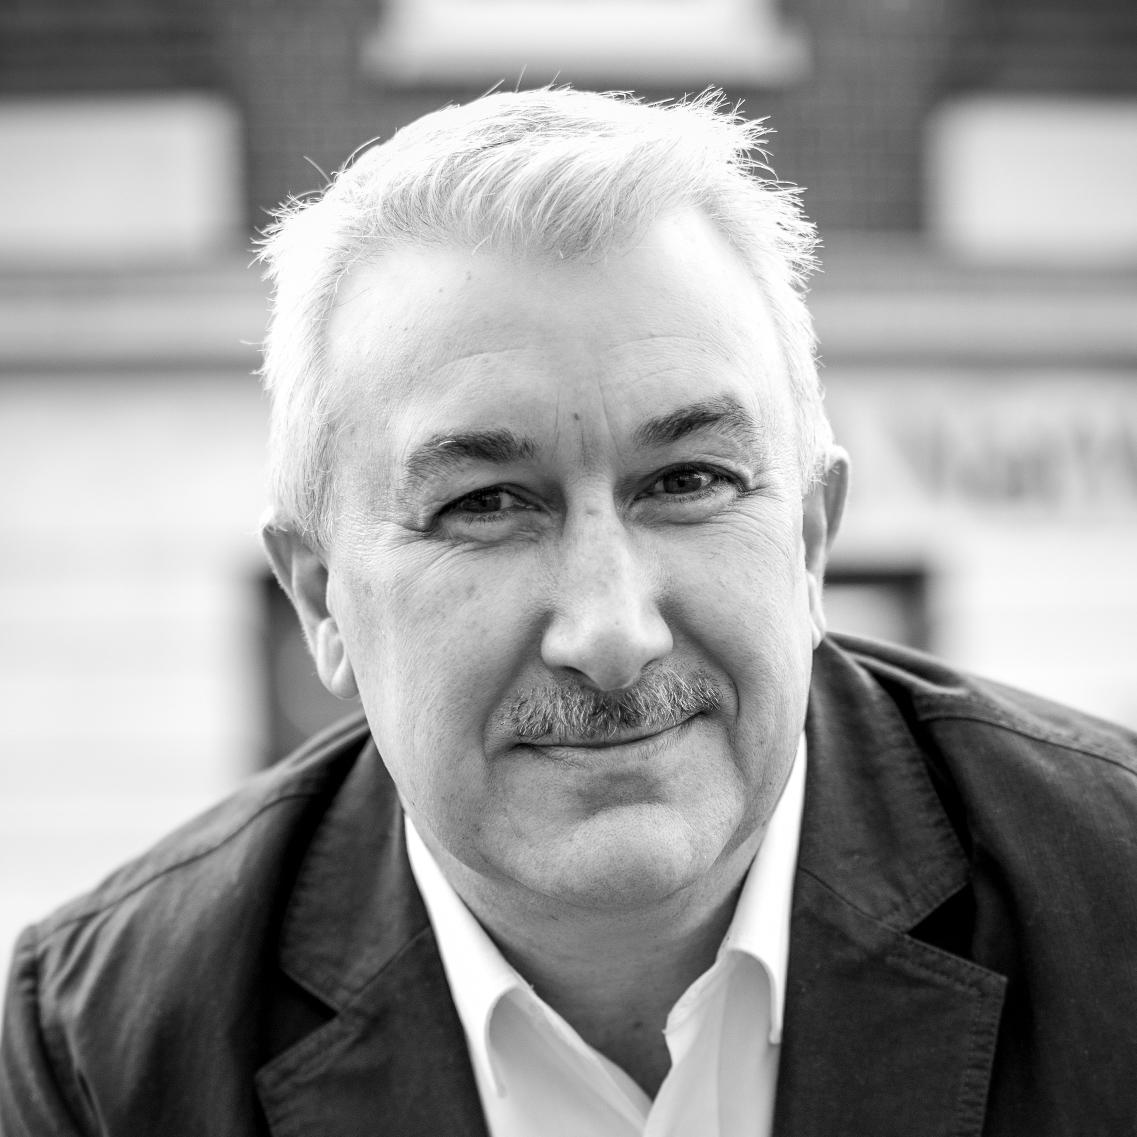 Andrew Vorster Innovation disruption futurist trends keynote speaker Great British Speakers